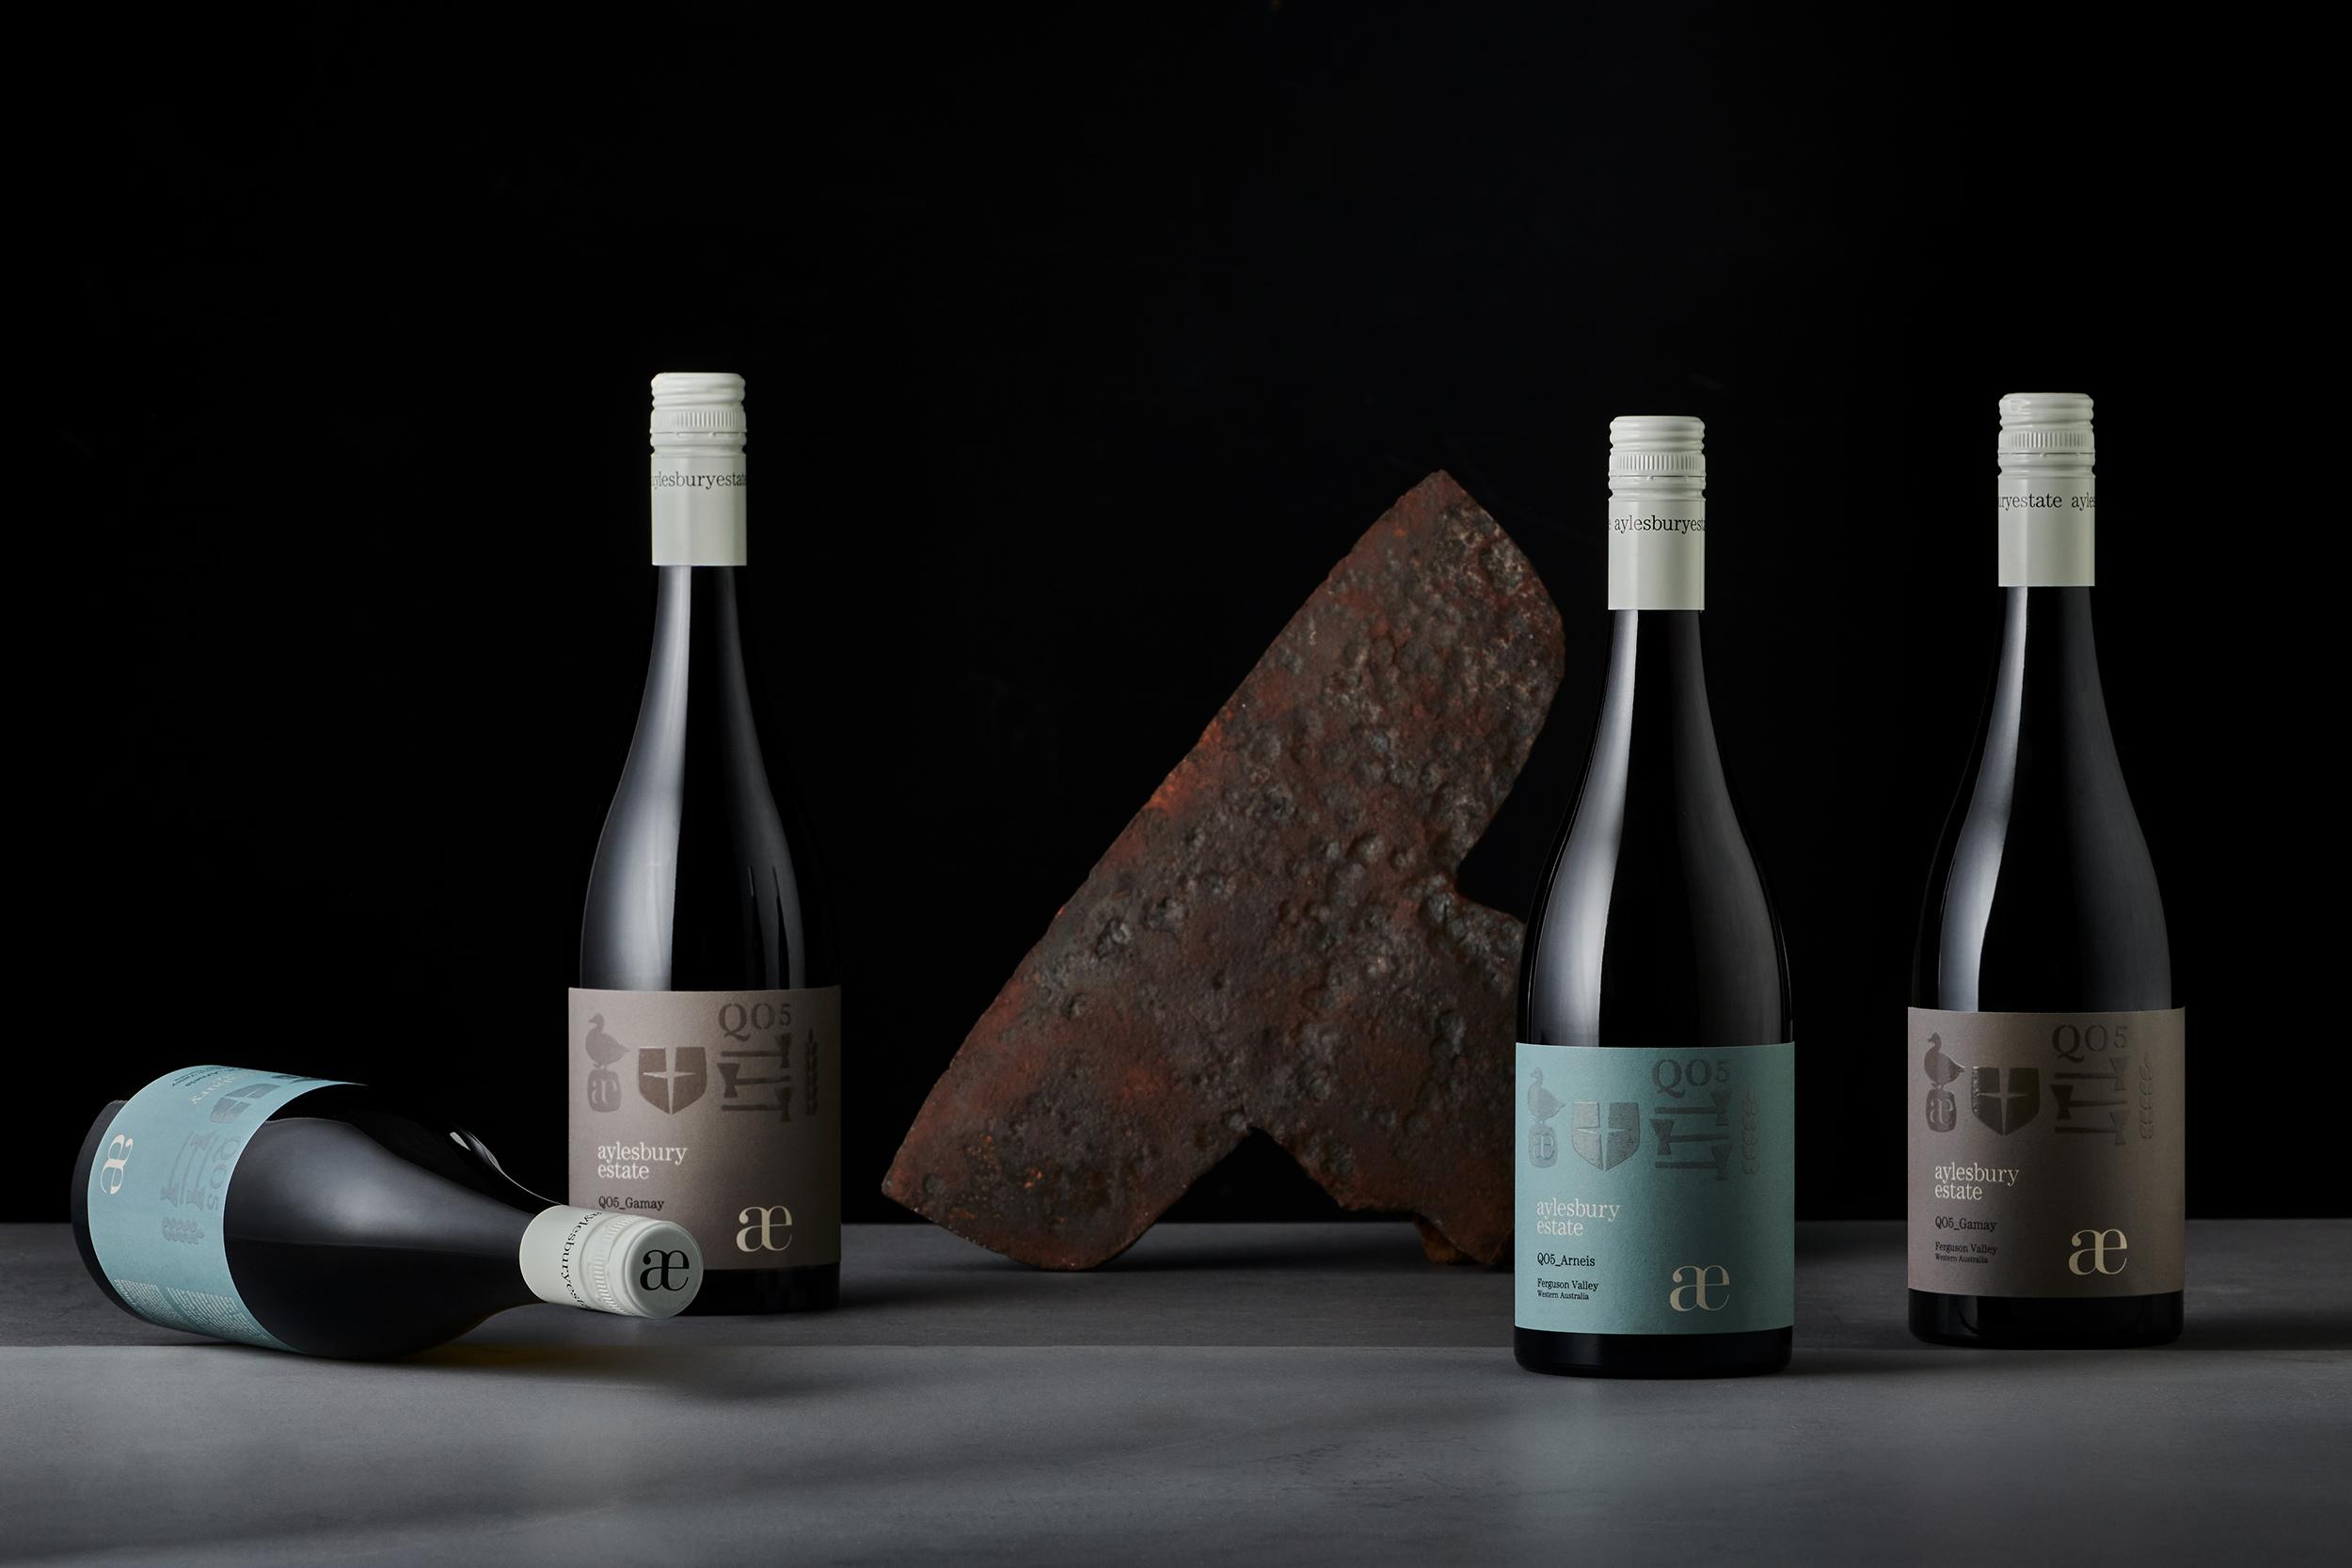 The Aylesbury Estate QO5 Wine Range Created by Harcus Design